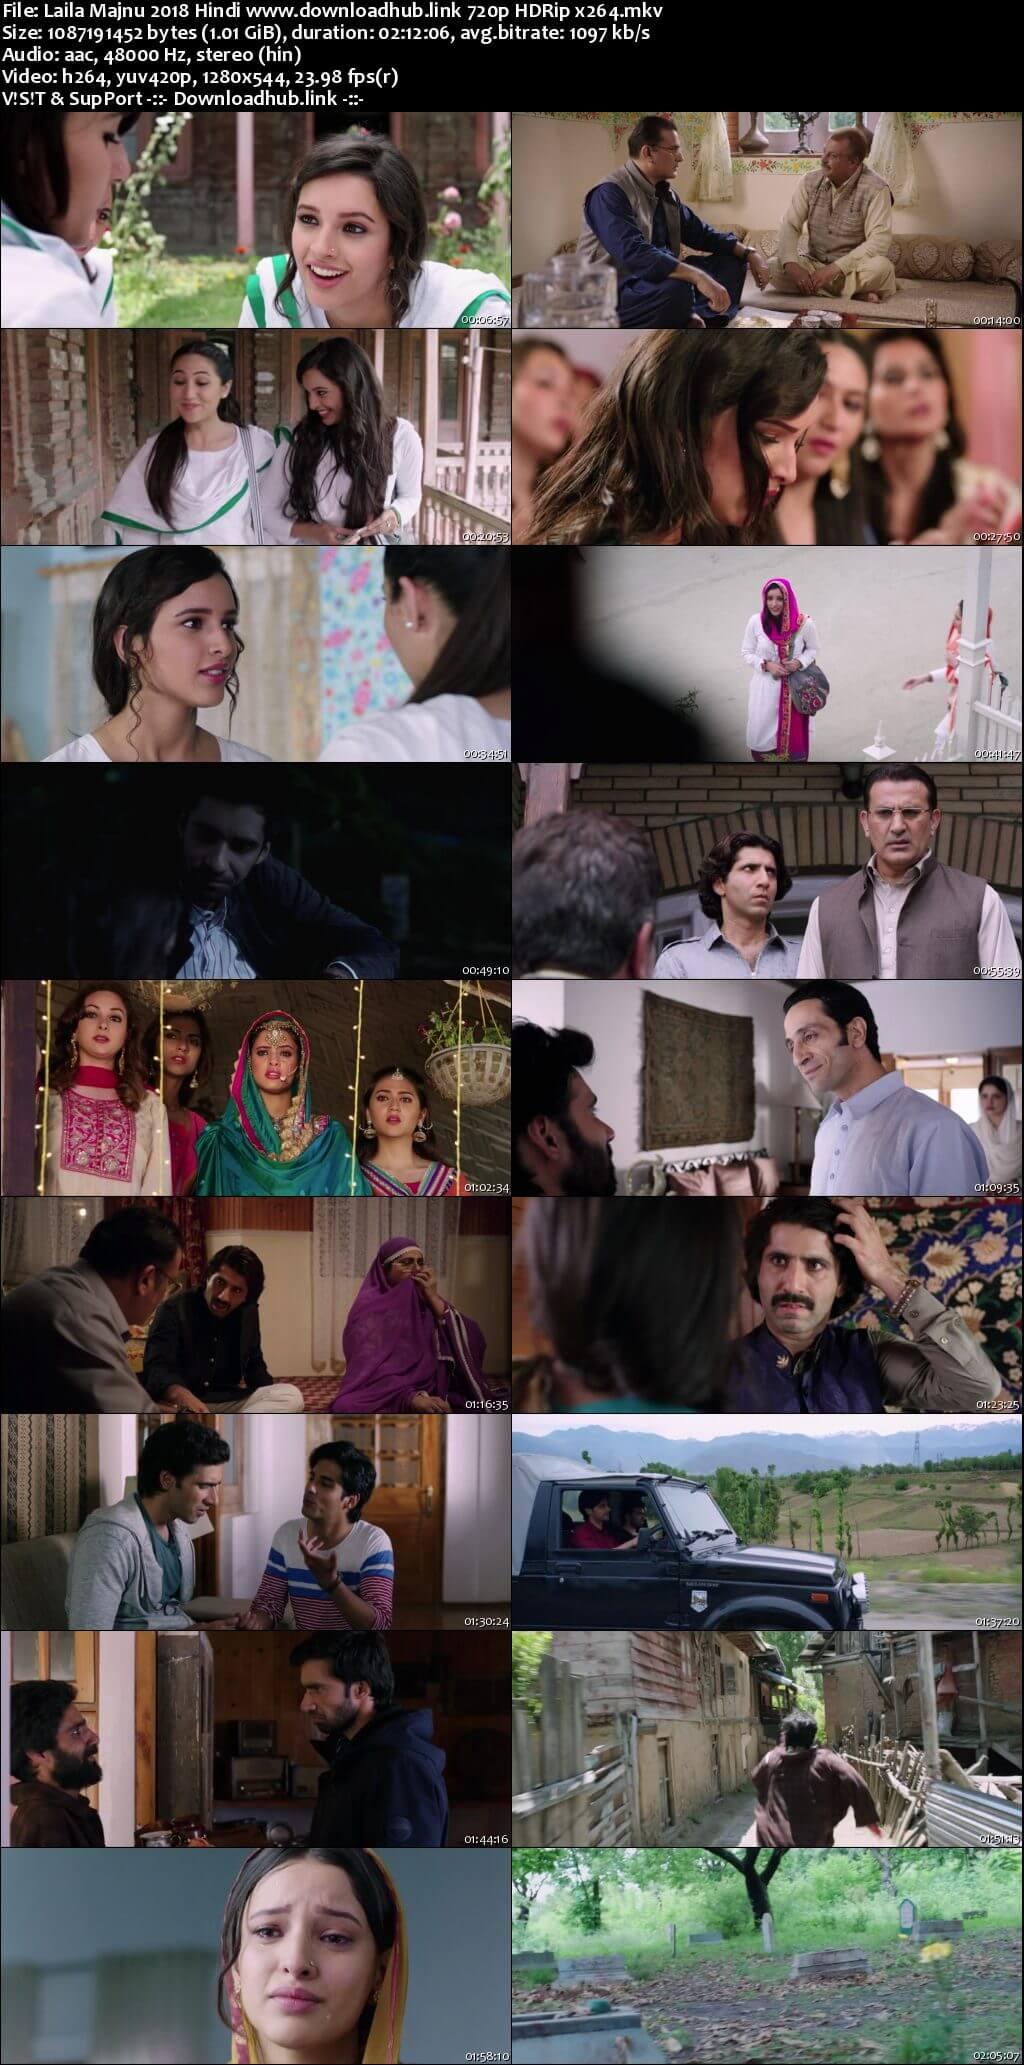 Laila Majnu 2018 Hindi 720p HDRip x264